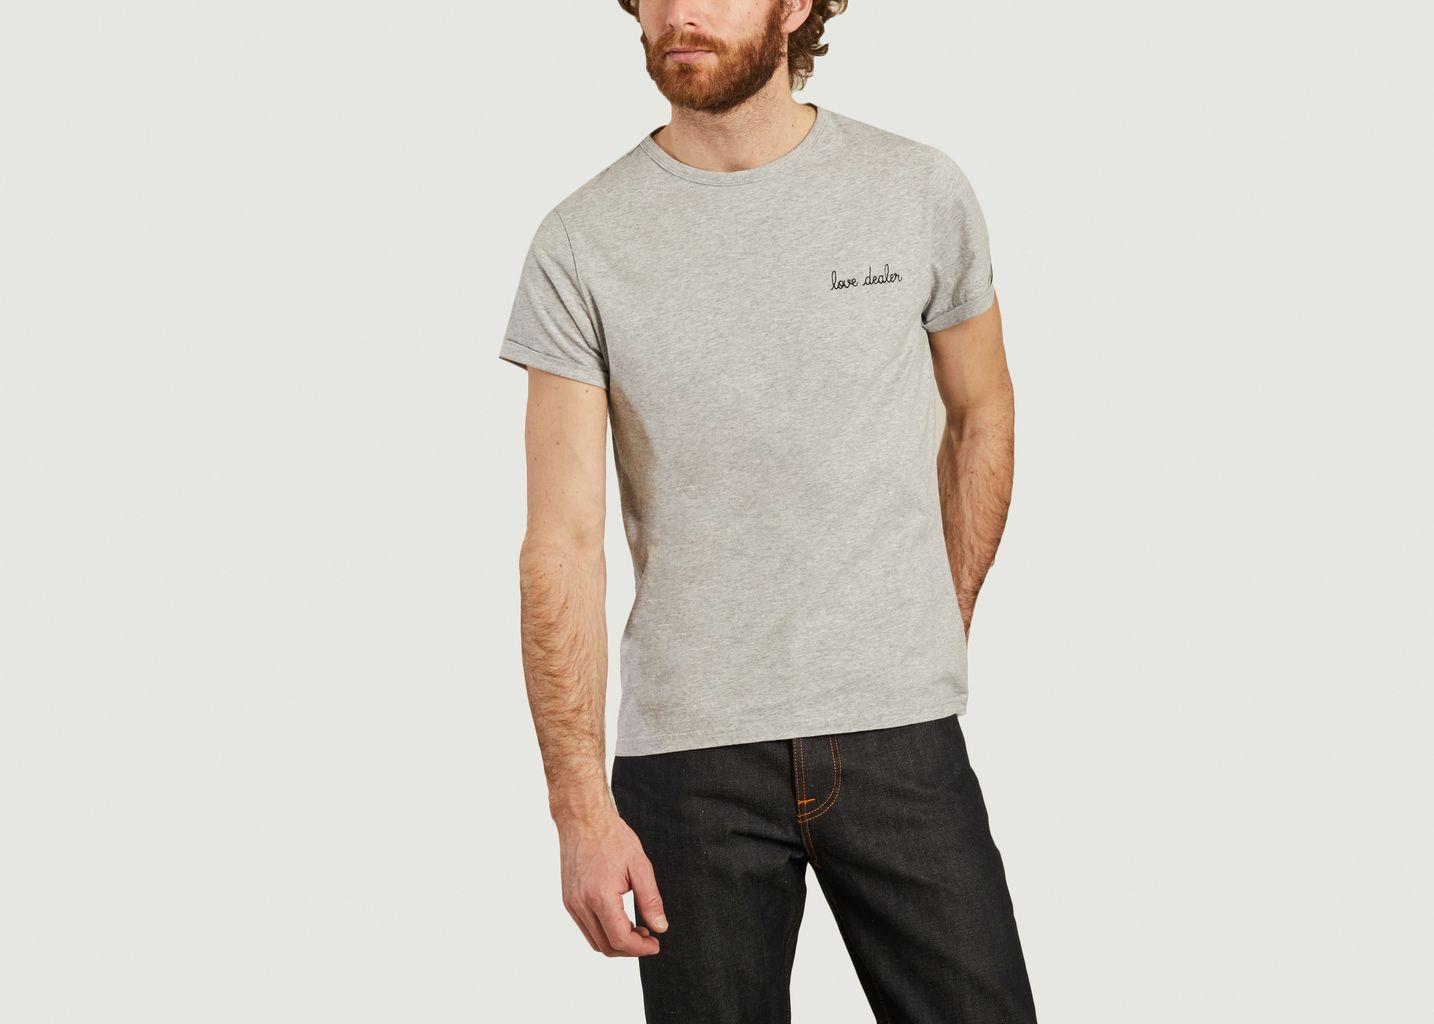 T-shirt Love Dealer - Maison Labiche